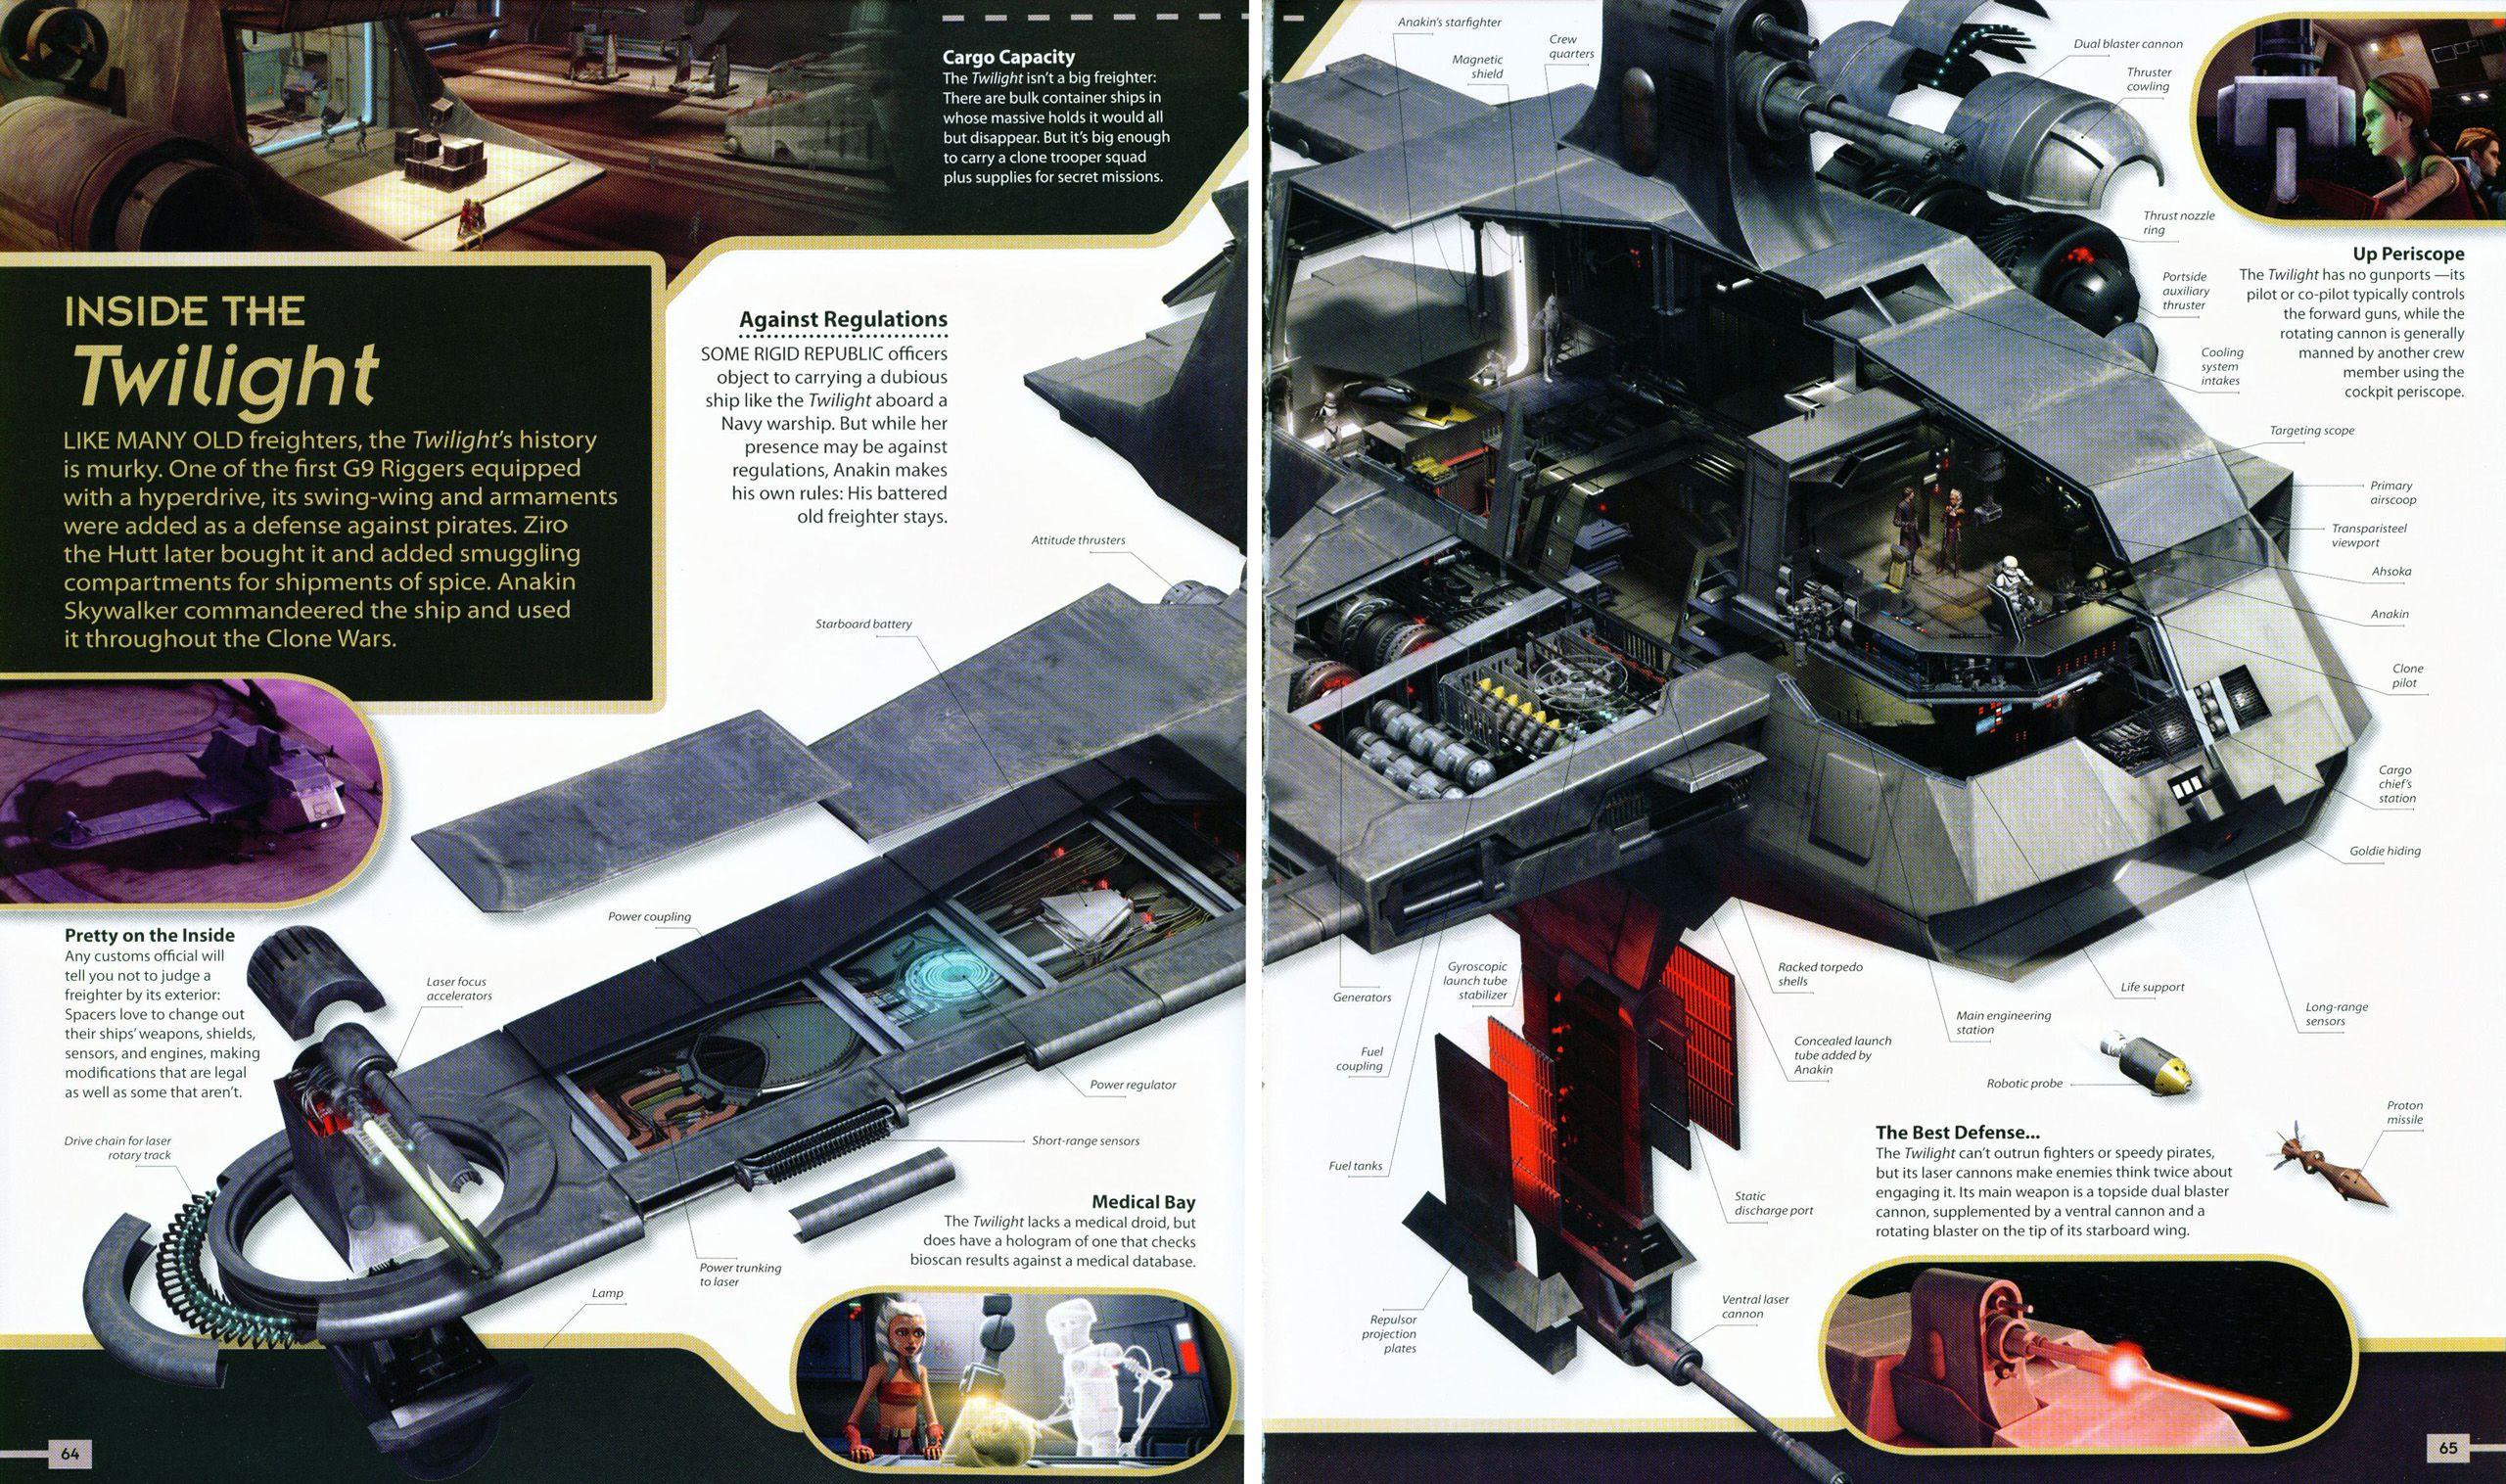 1409460955198 Jpg 2560 1516 Star Wars Clone Wars Star Wars Vehicles Star Wars Rpg